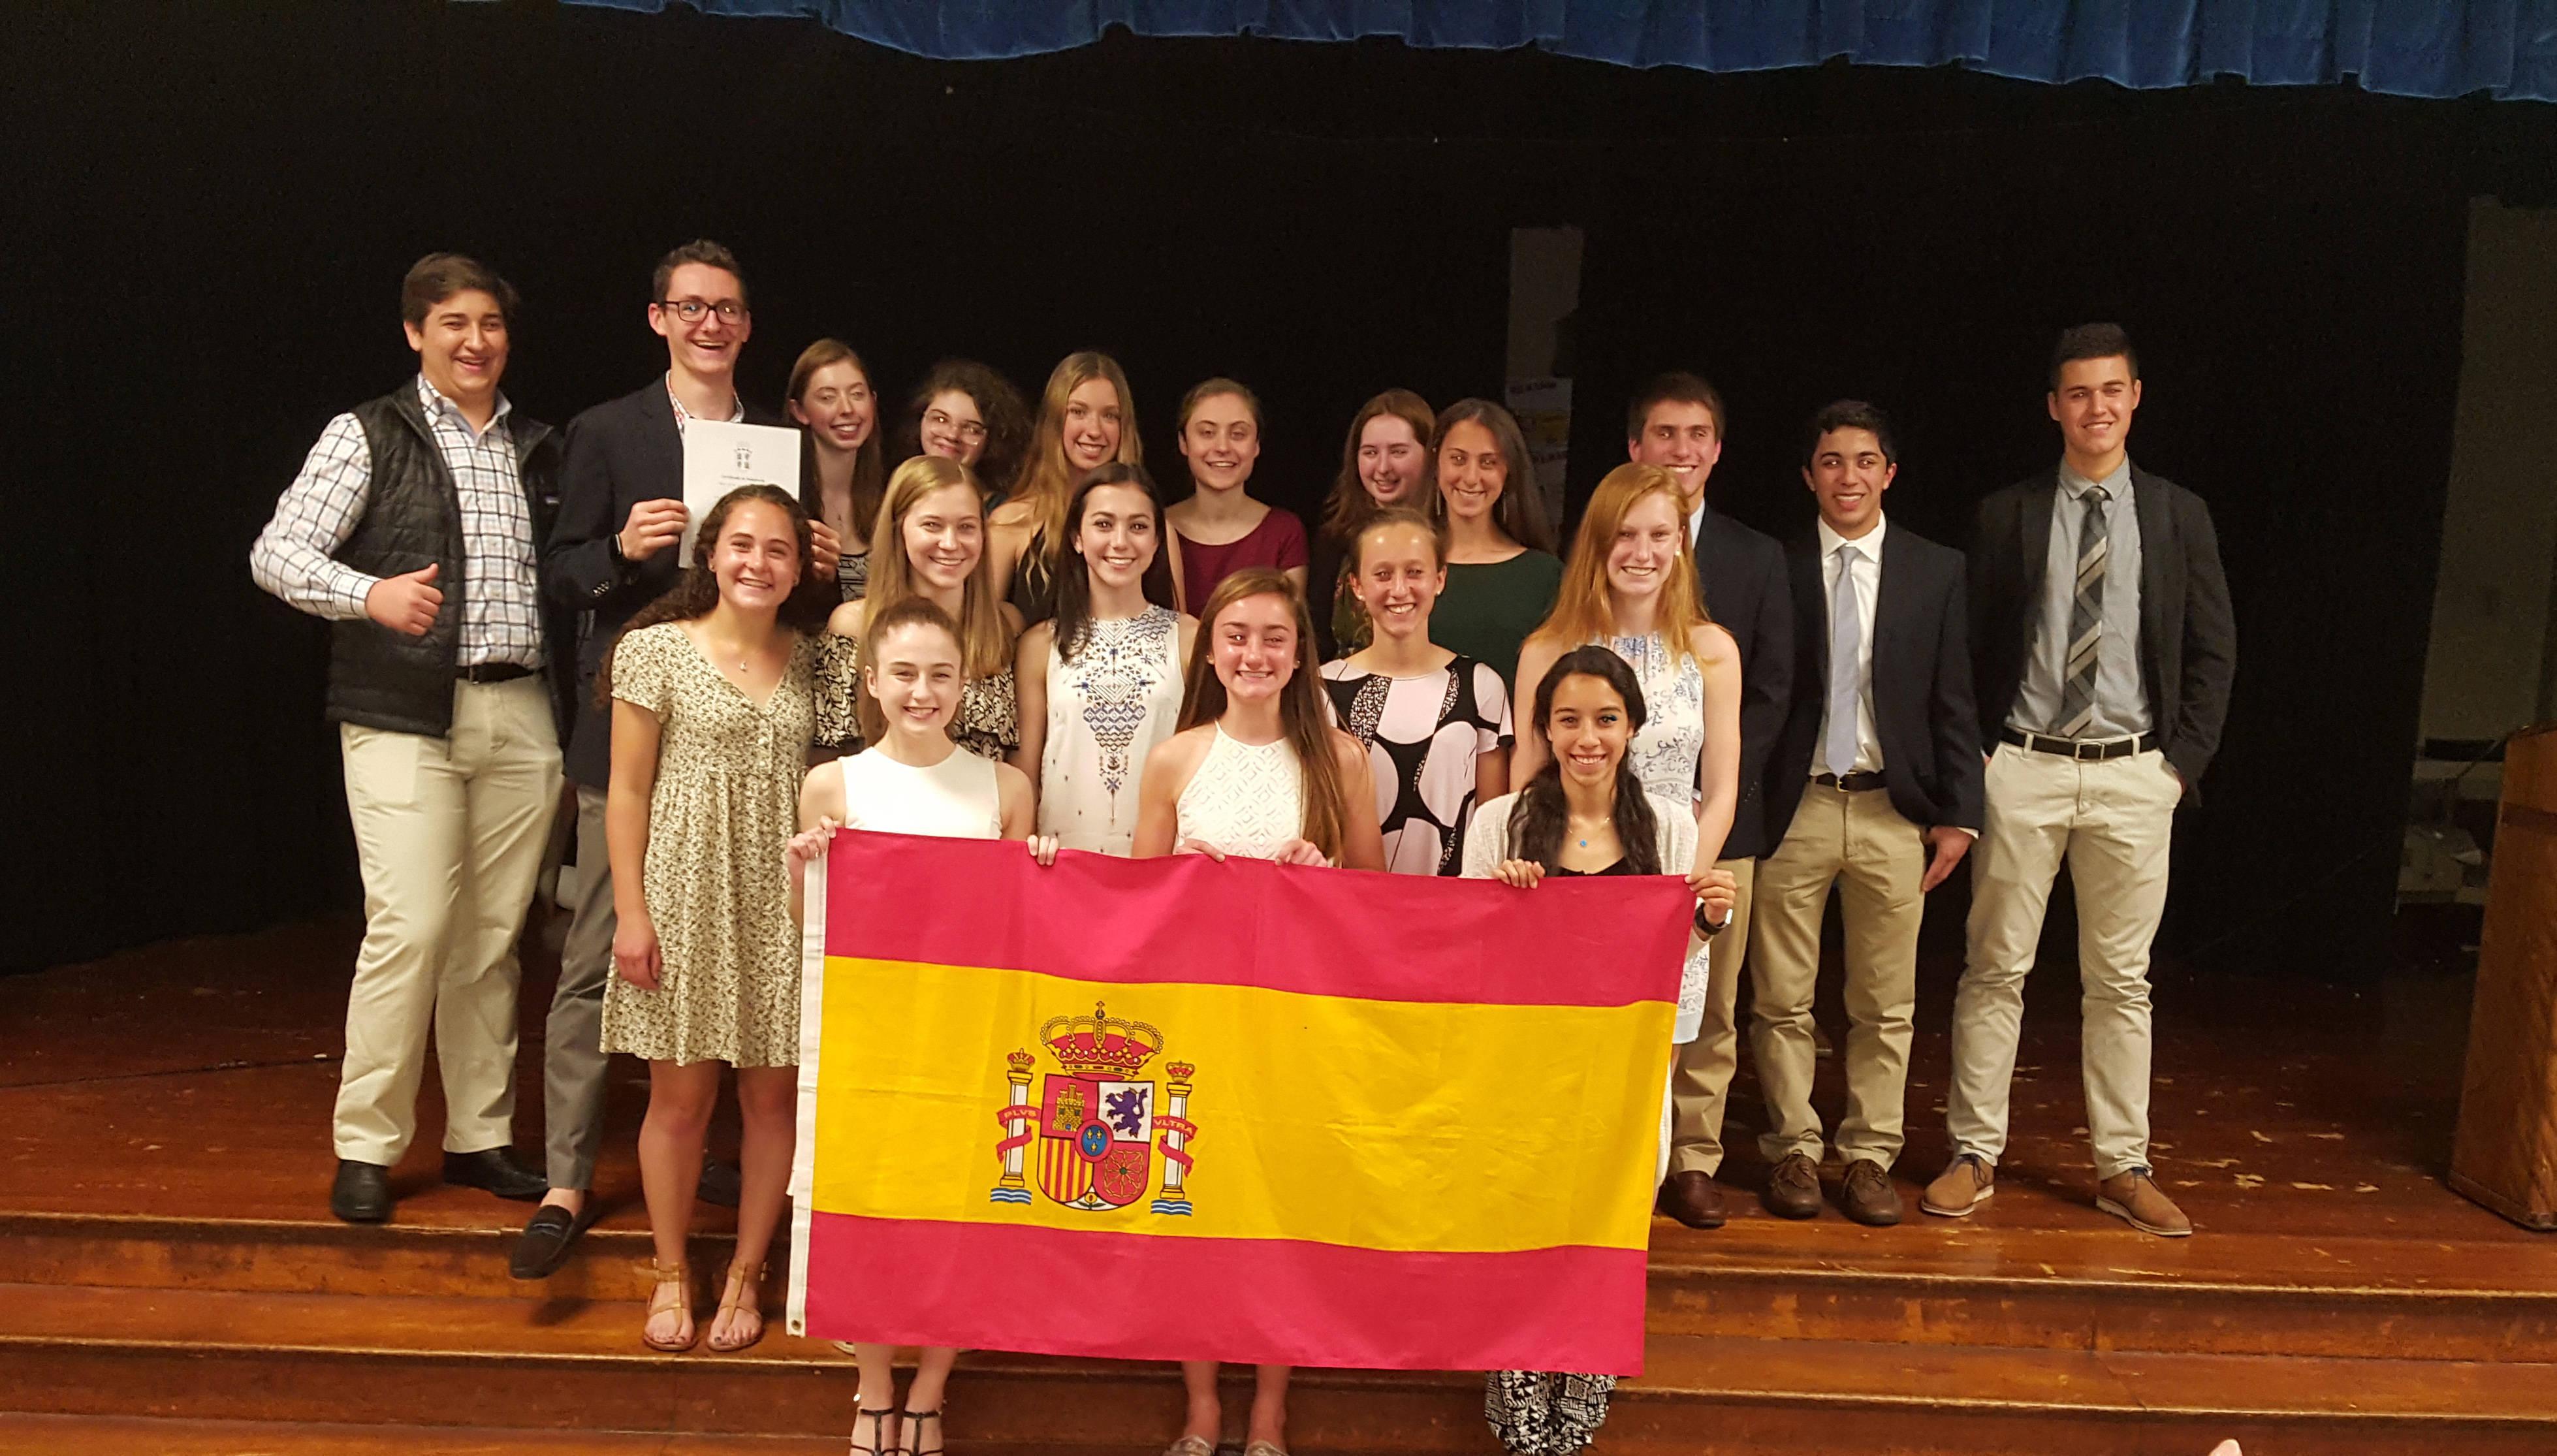 0292752b73a066fb85d5_02aeb8b88ab7a571ea91_Spanish_Honor_Society_May_2017.jpg